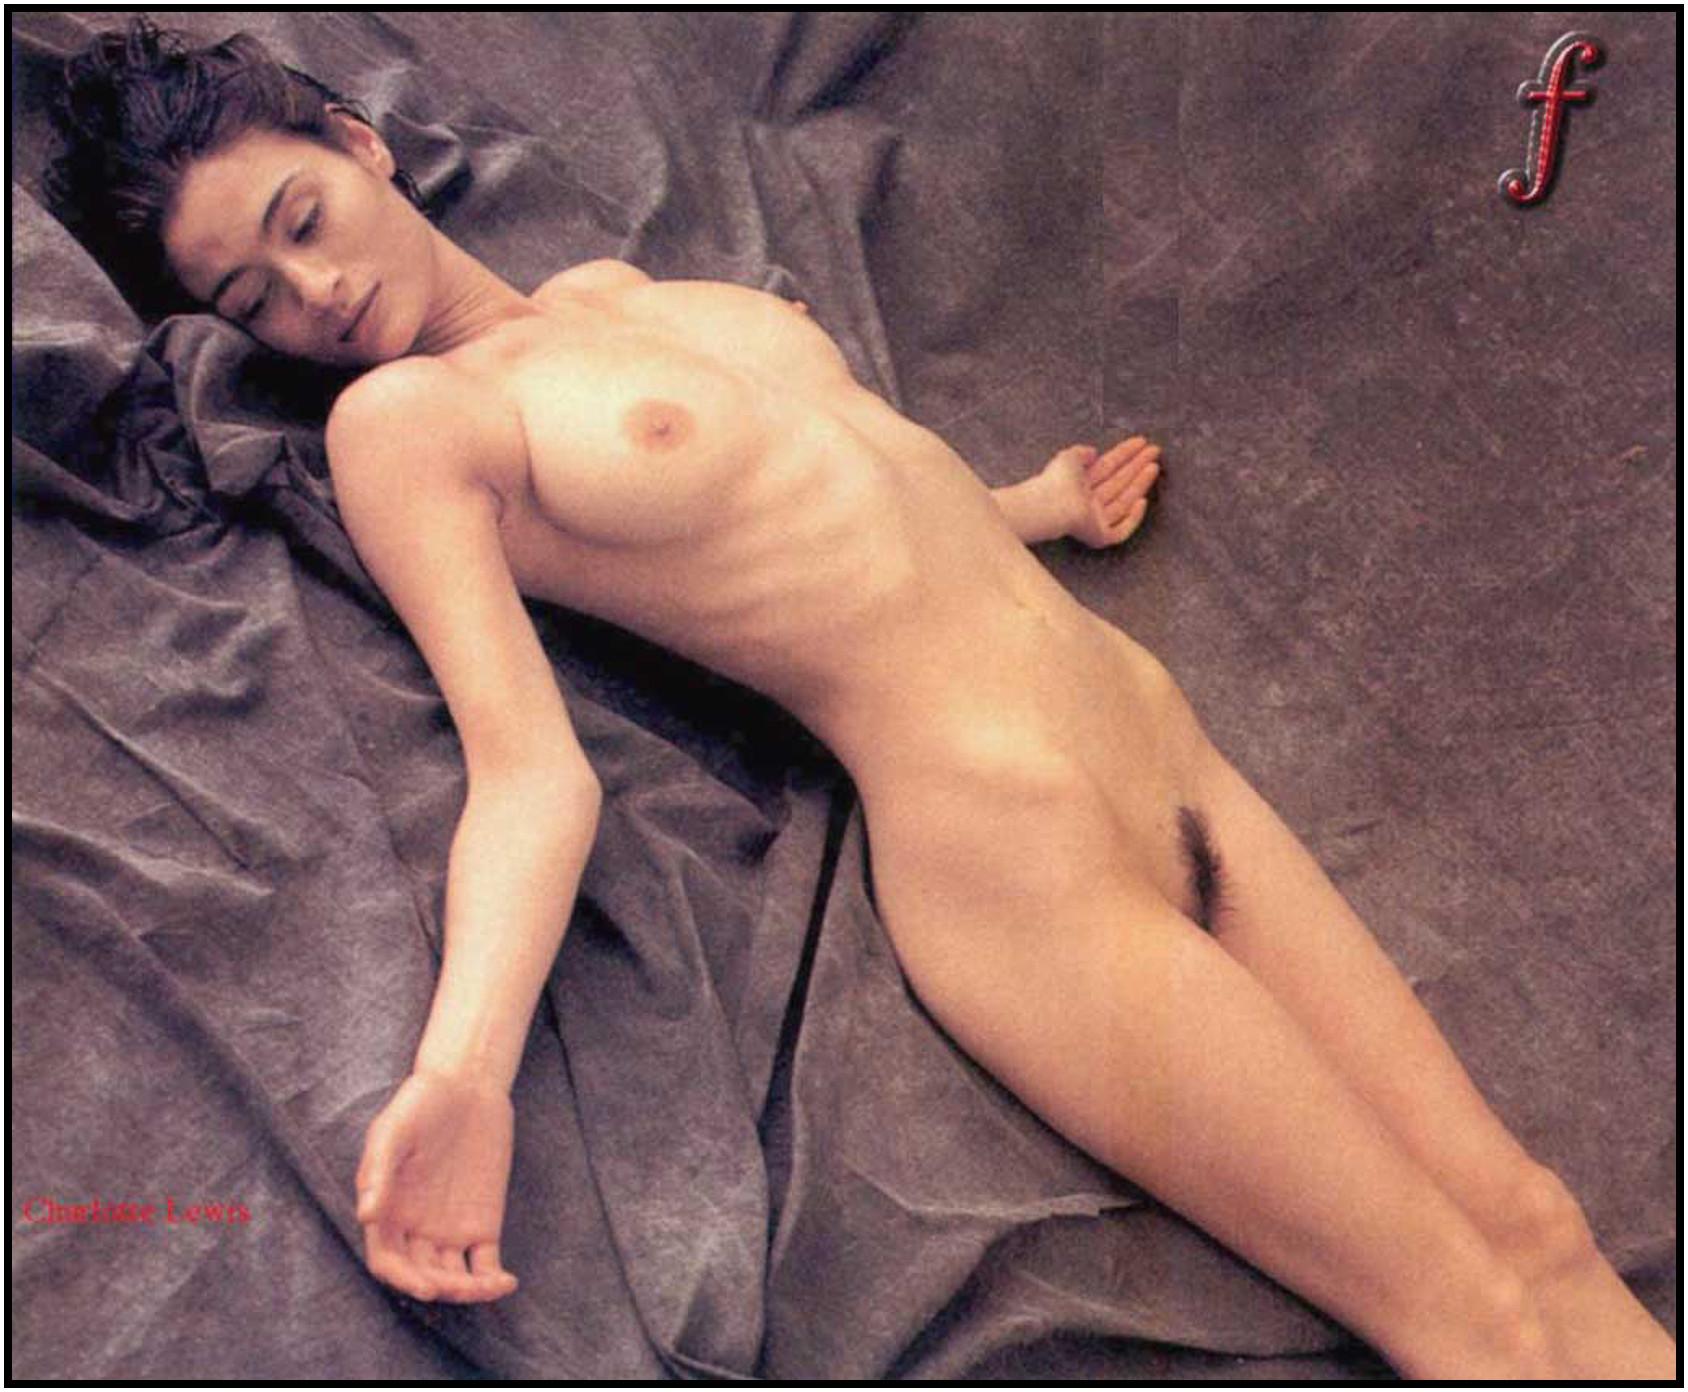 Alyssa milano embrace of the vampire photo shoot only 6